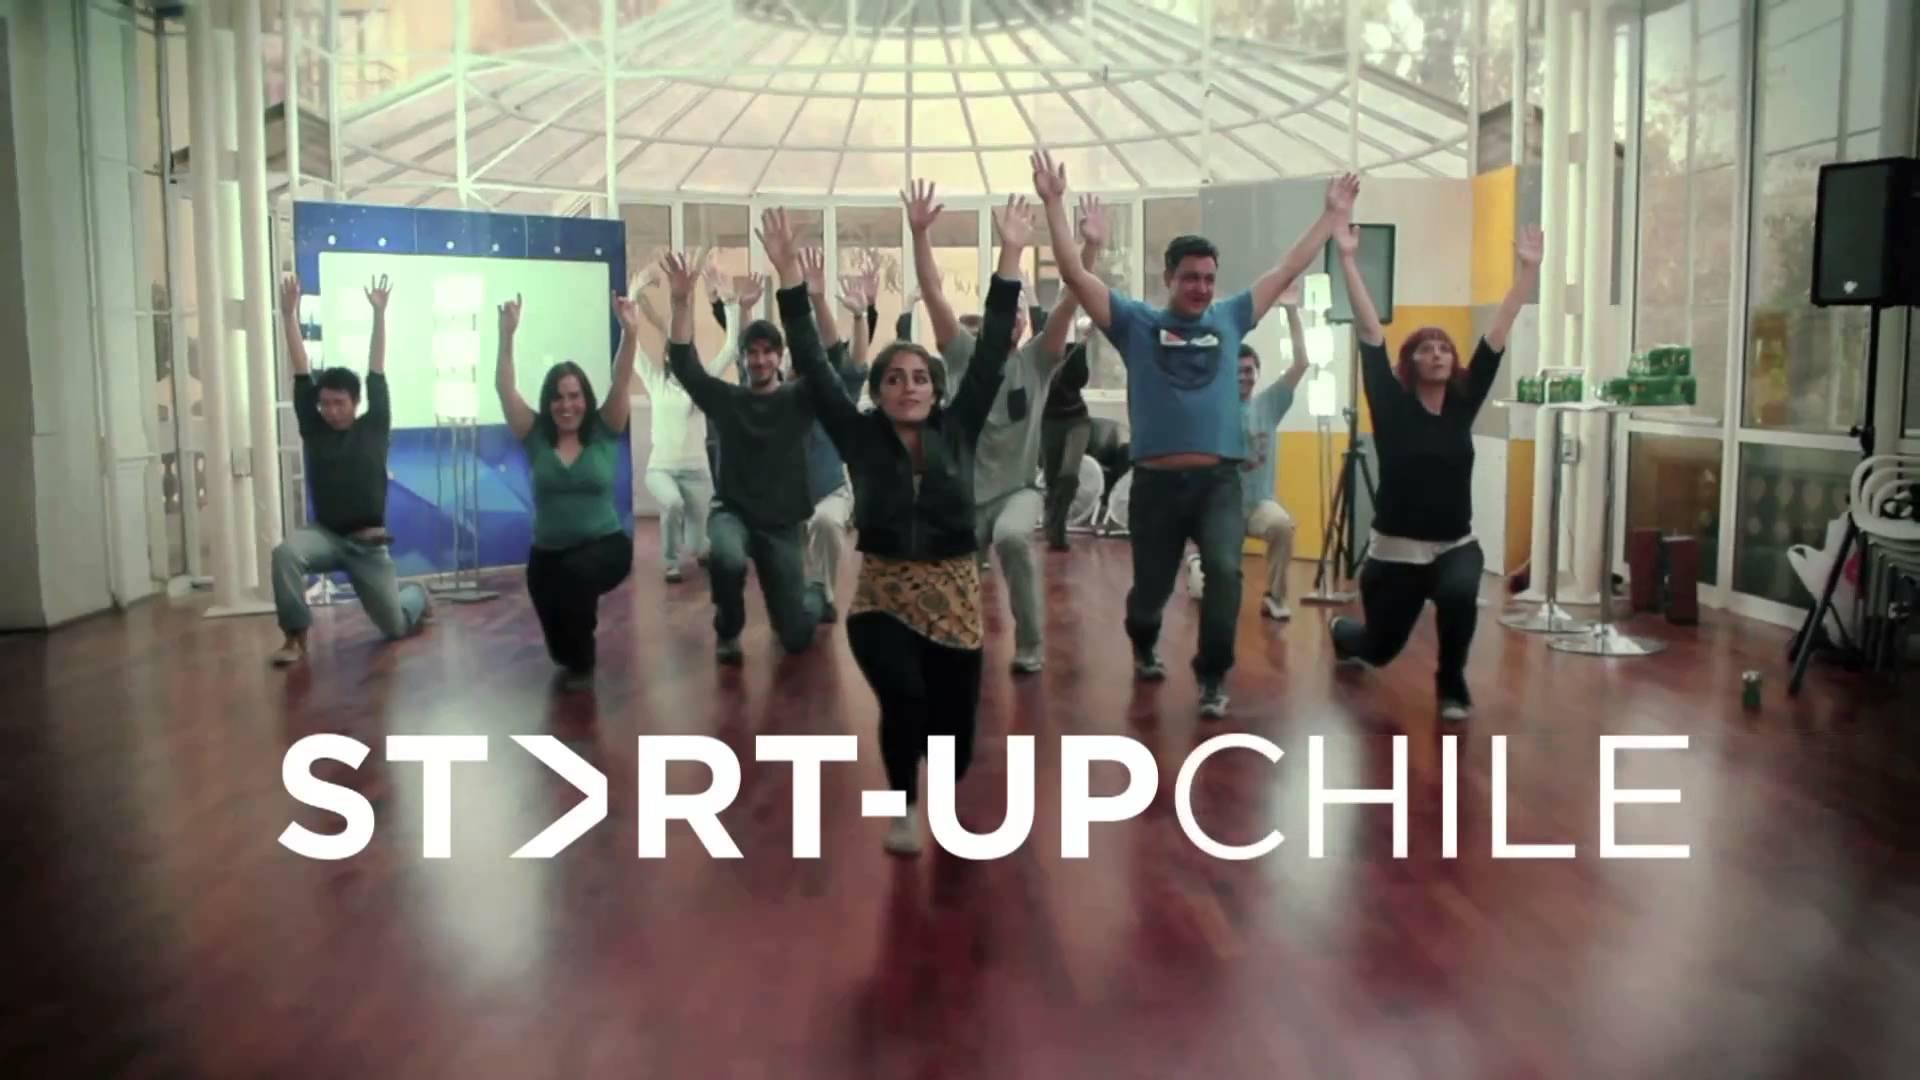 Nueva convocatoria de Start-Up Chile